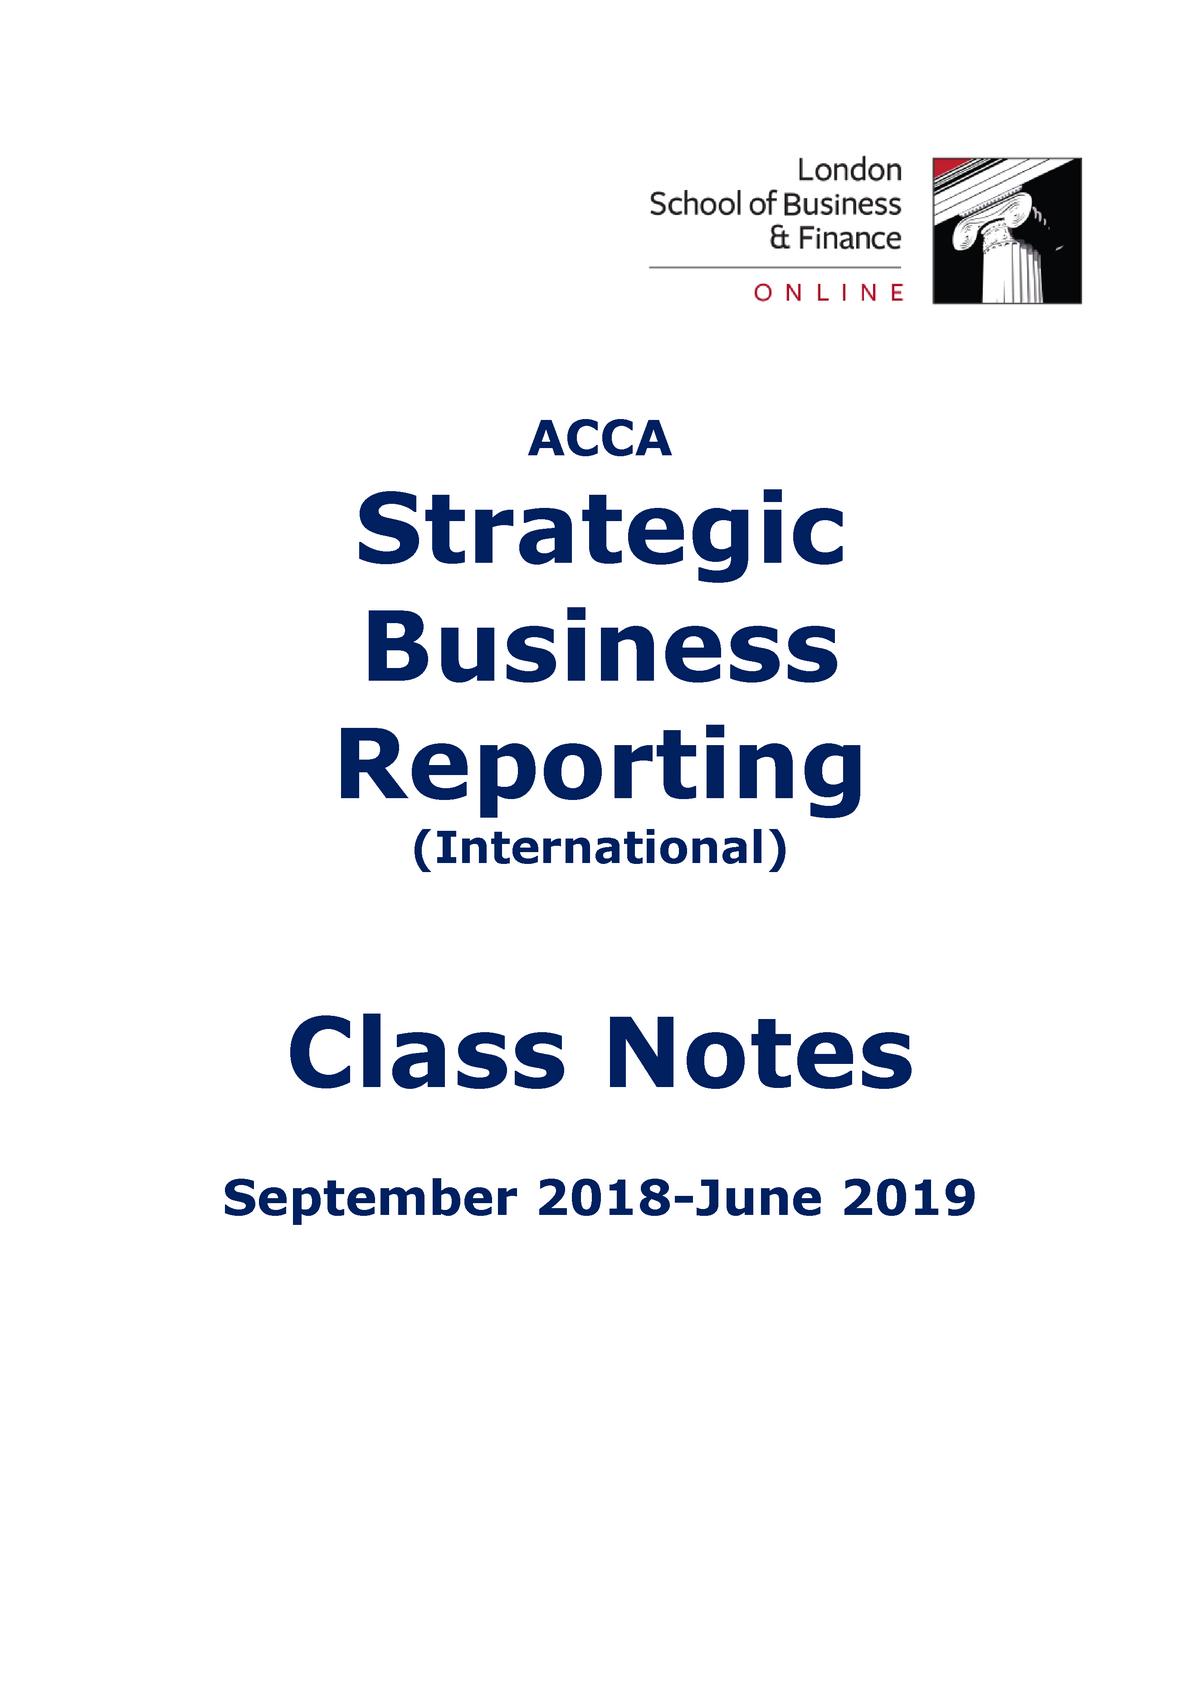 ACCA LSBF SBR - Class Notes - September 2018 June 2019 - StuDocu